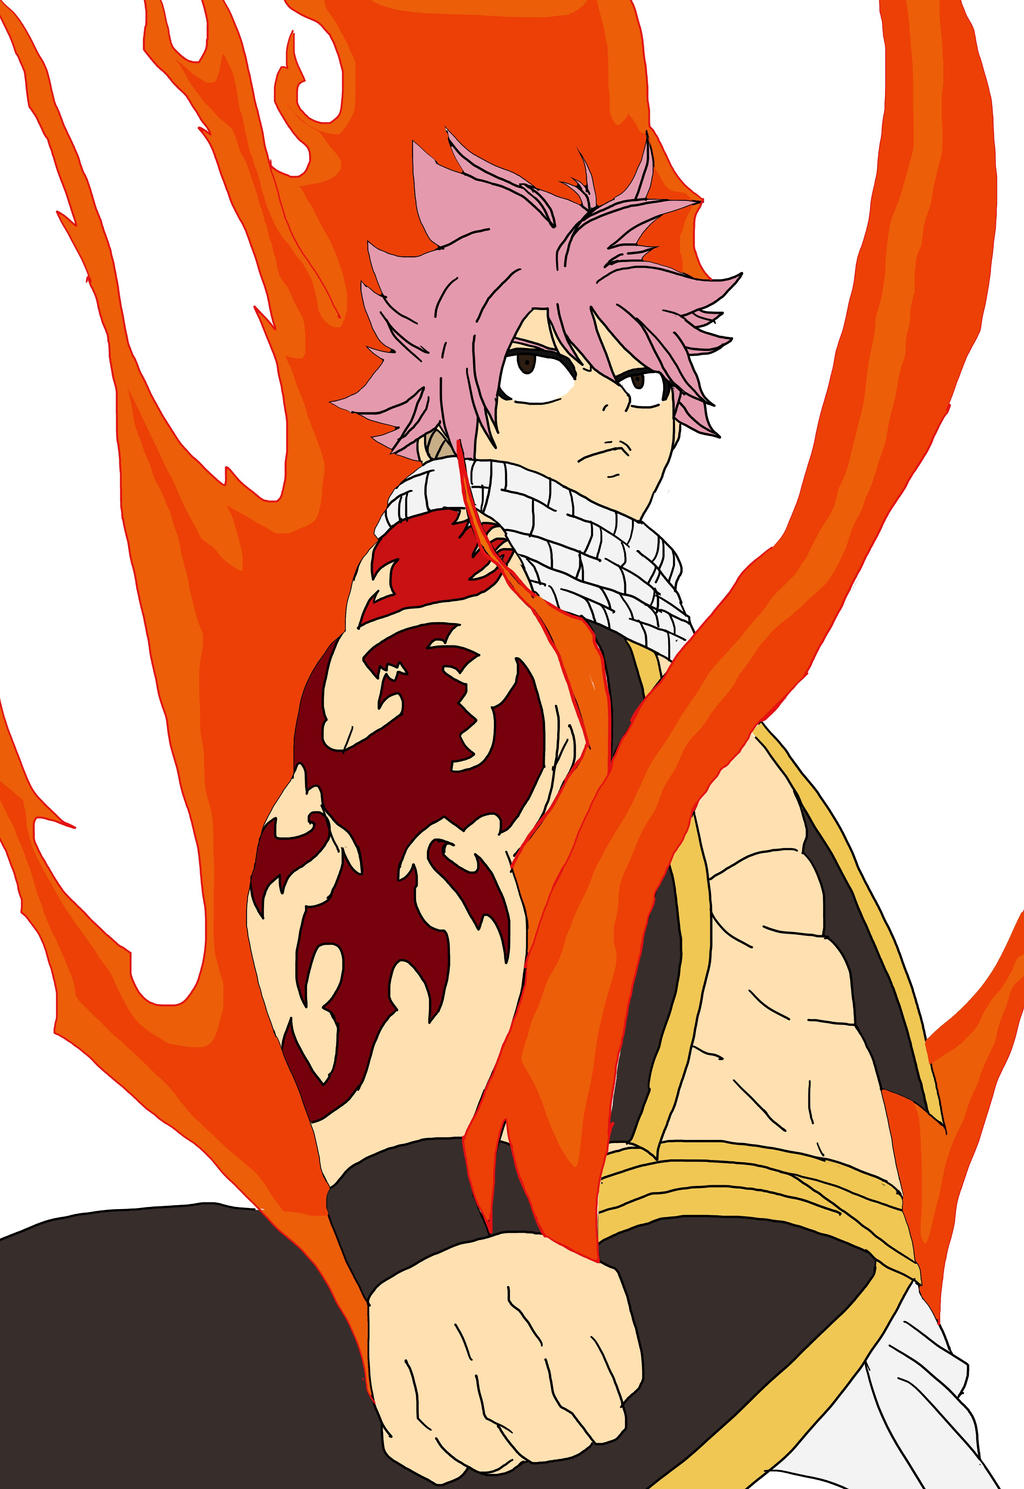 Natsu Fire Dragon King By Triton Demius On Deviantart